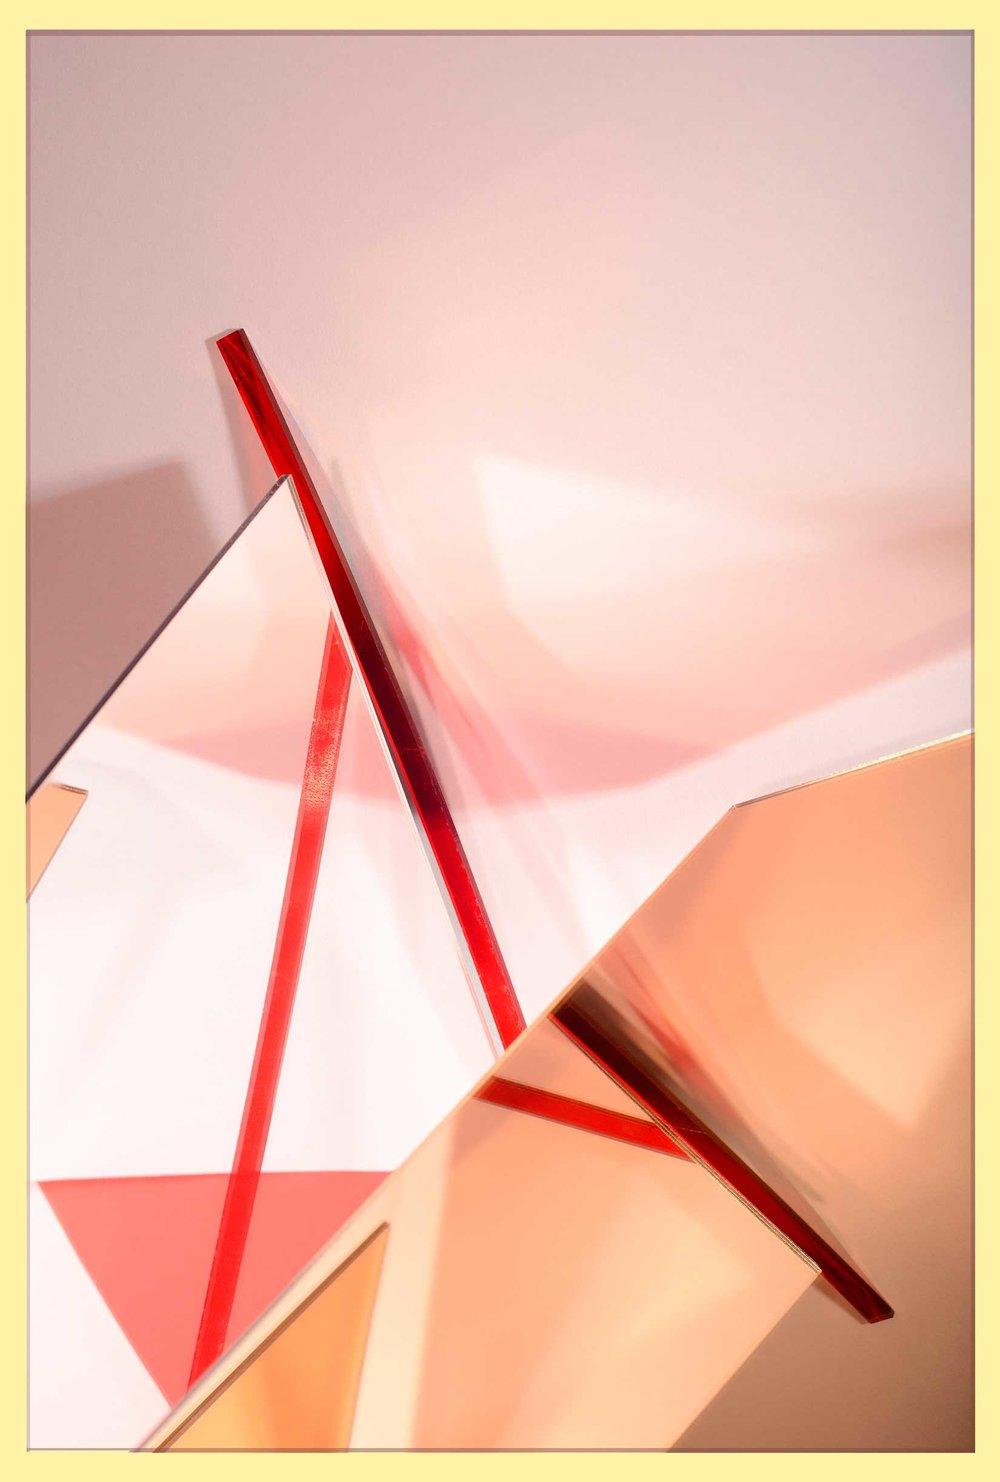 LYDIA WEGNER   Red Mirror Cut  2017 Archival inkjet print 106 x 71 cm